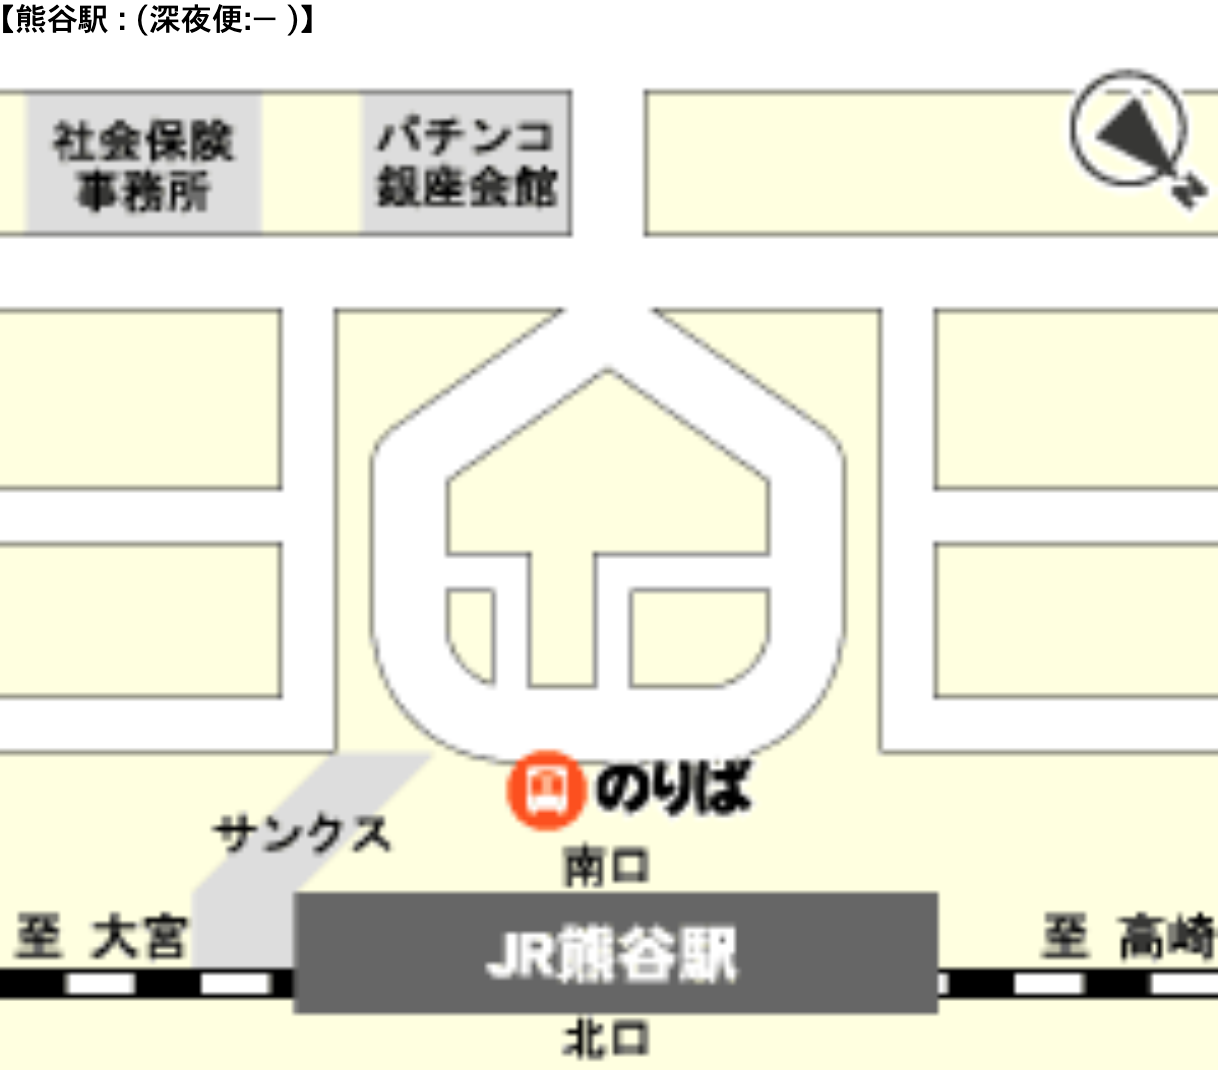 空港バス 熊谷駅 案内図